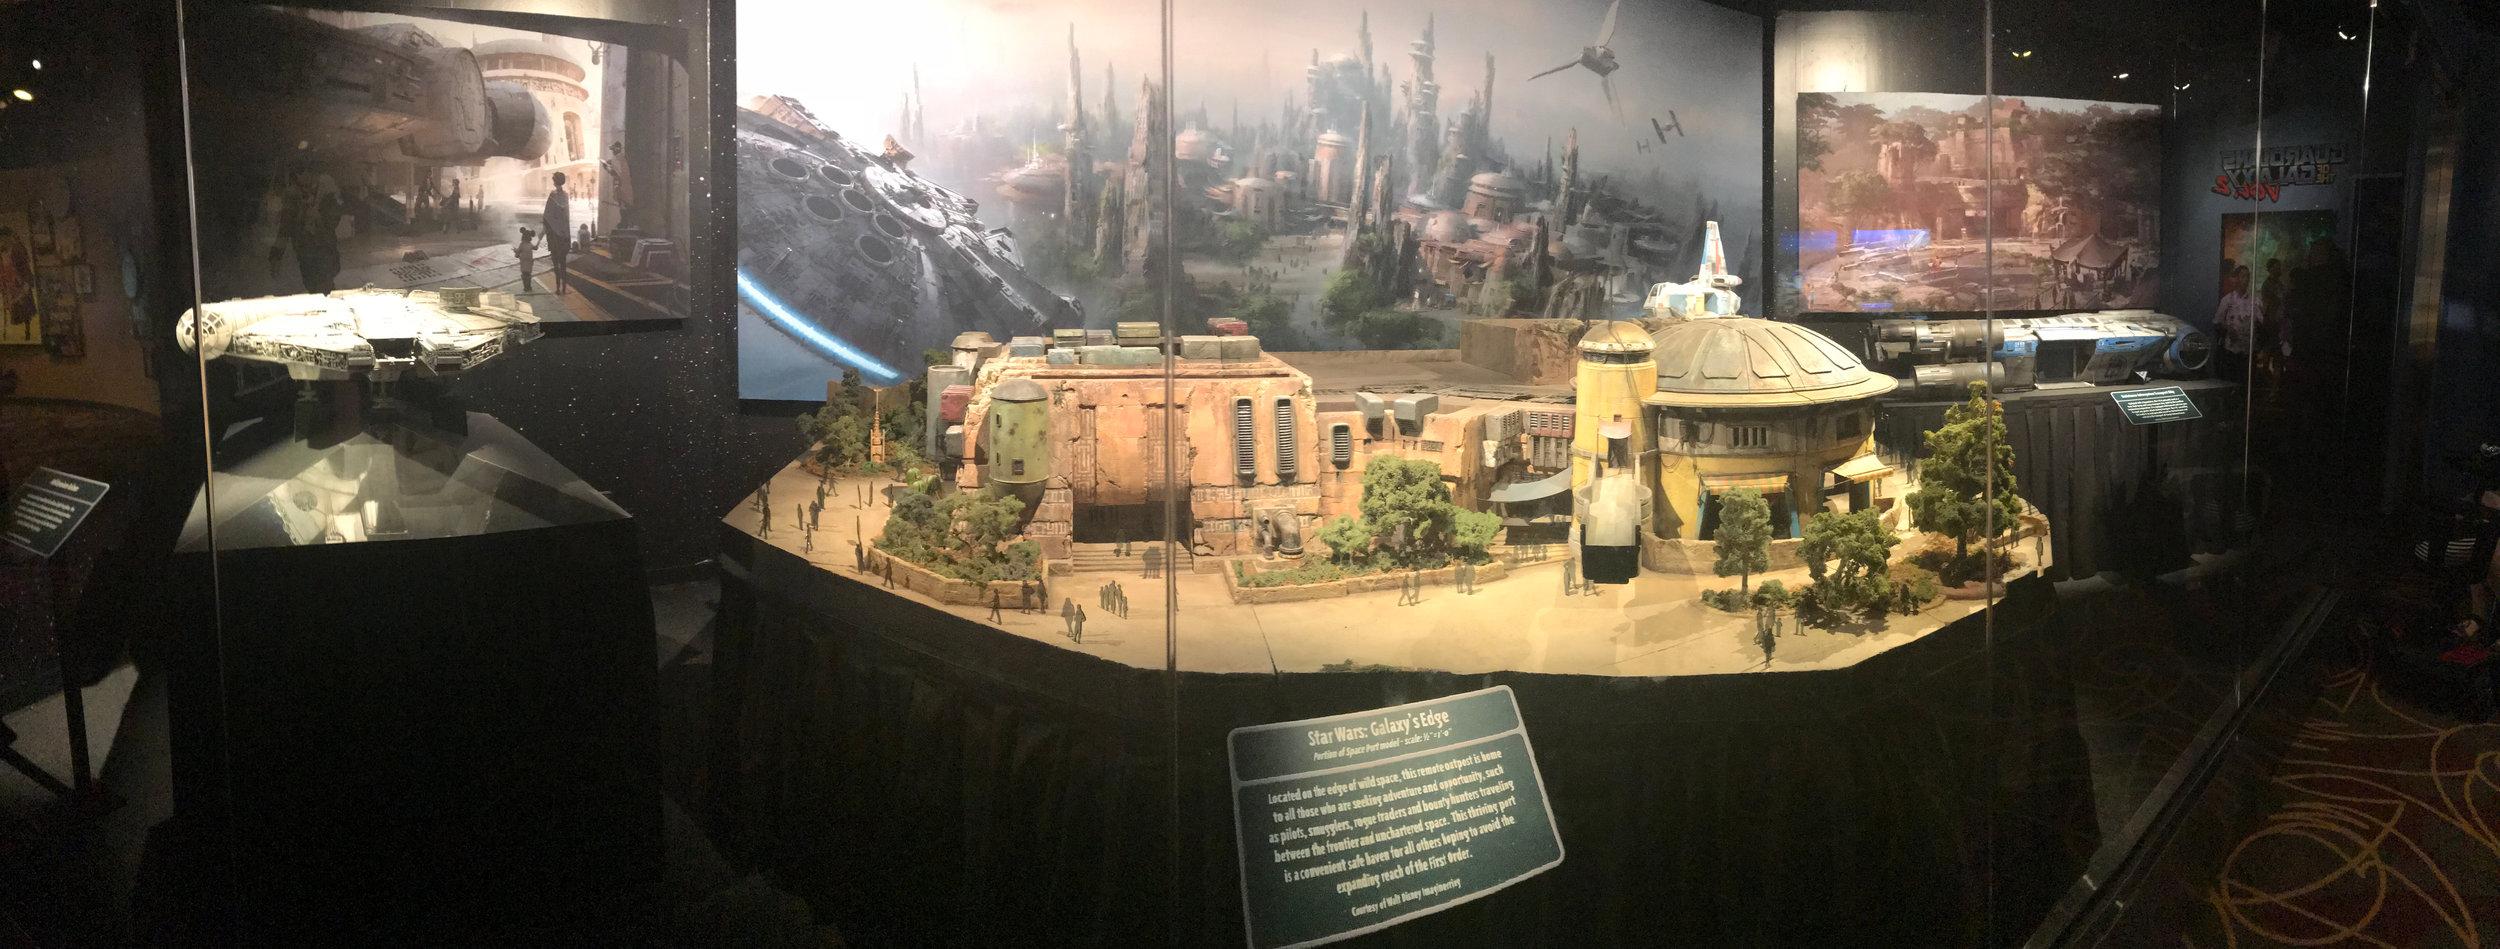 Model of Star Wars: Galaxy's Edge on display at Walt Disney Presents in Disney Hollywood Studios.